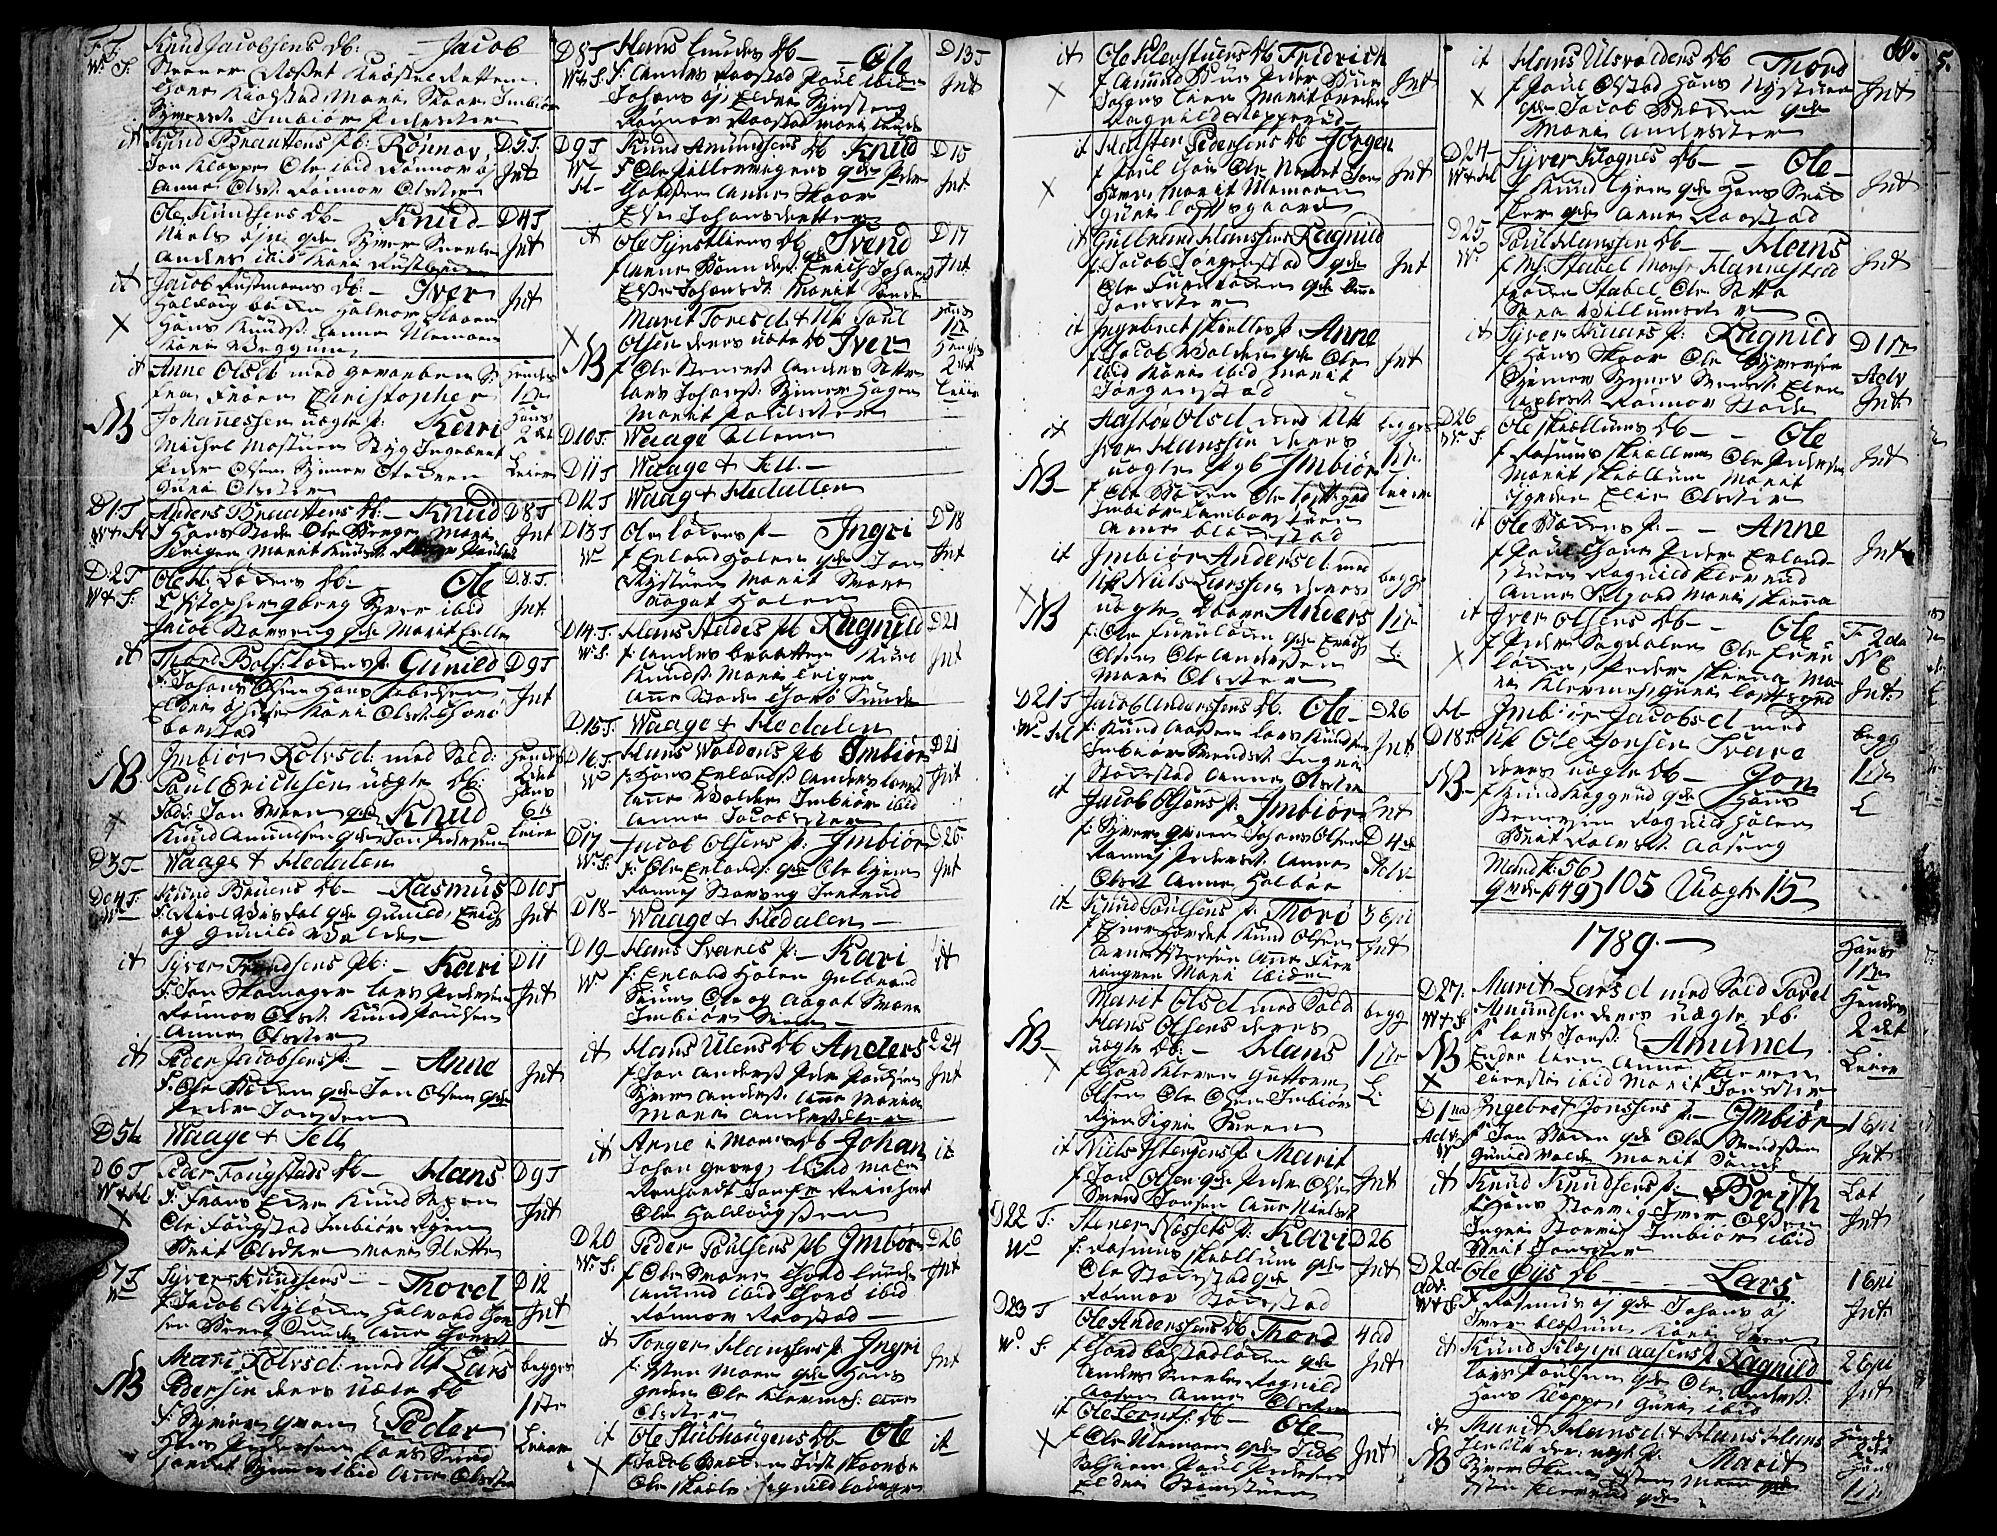 SAH, Vågå prestekontor, Ministerialbok nr. 1, 1739-1810, s. 88